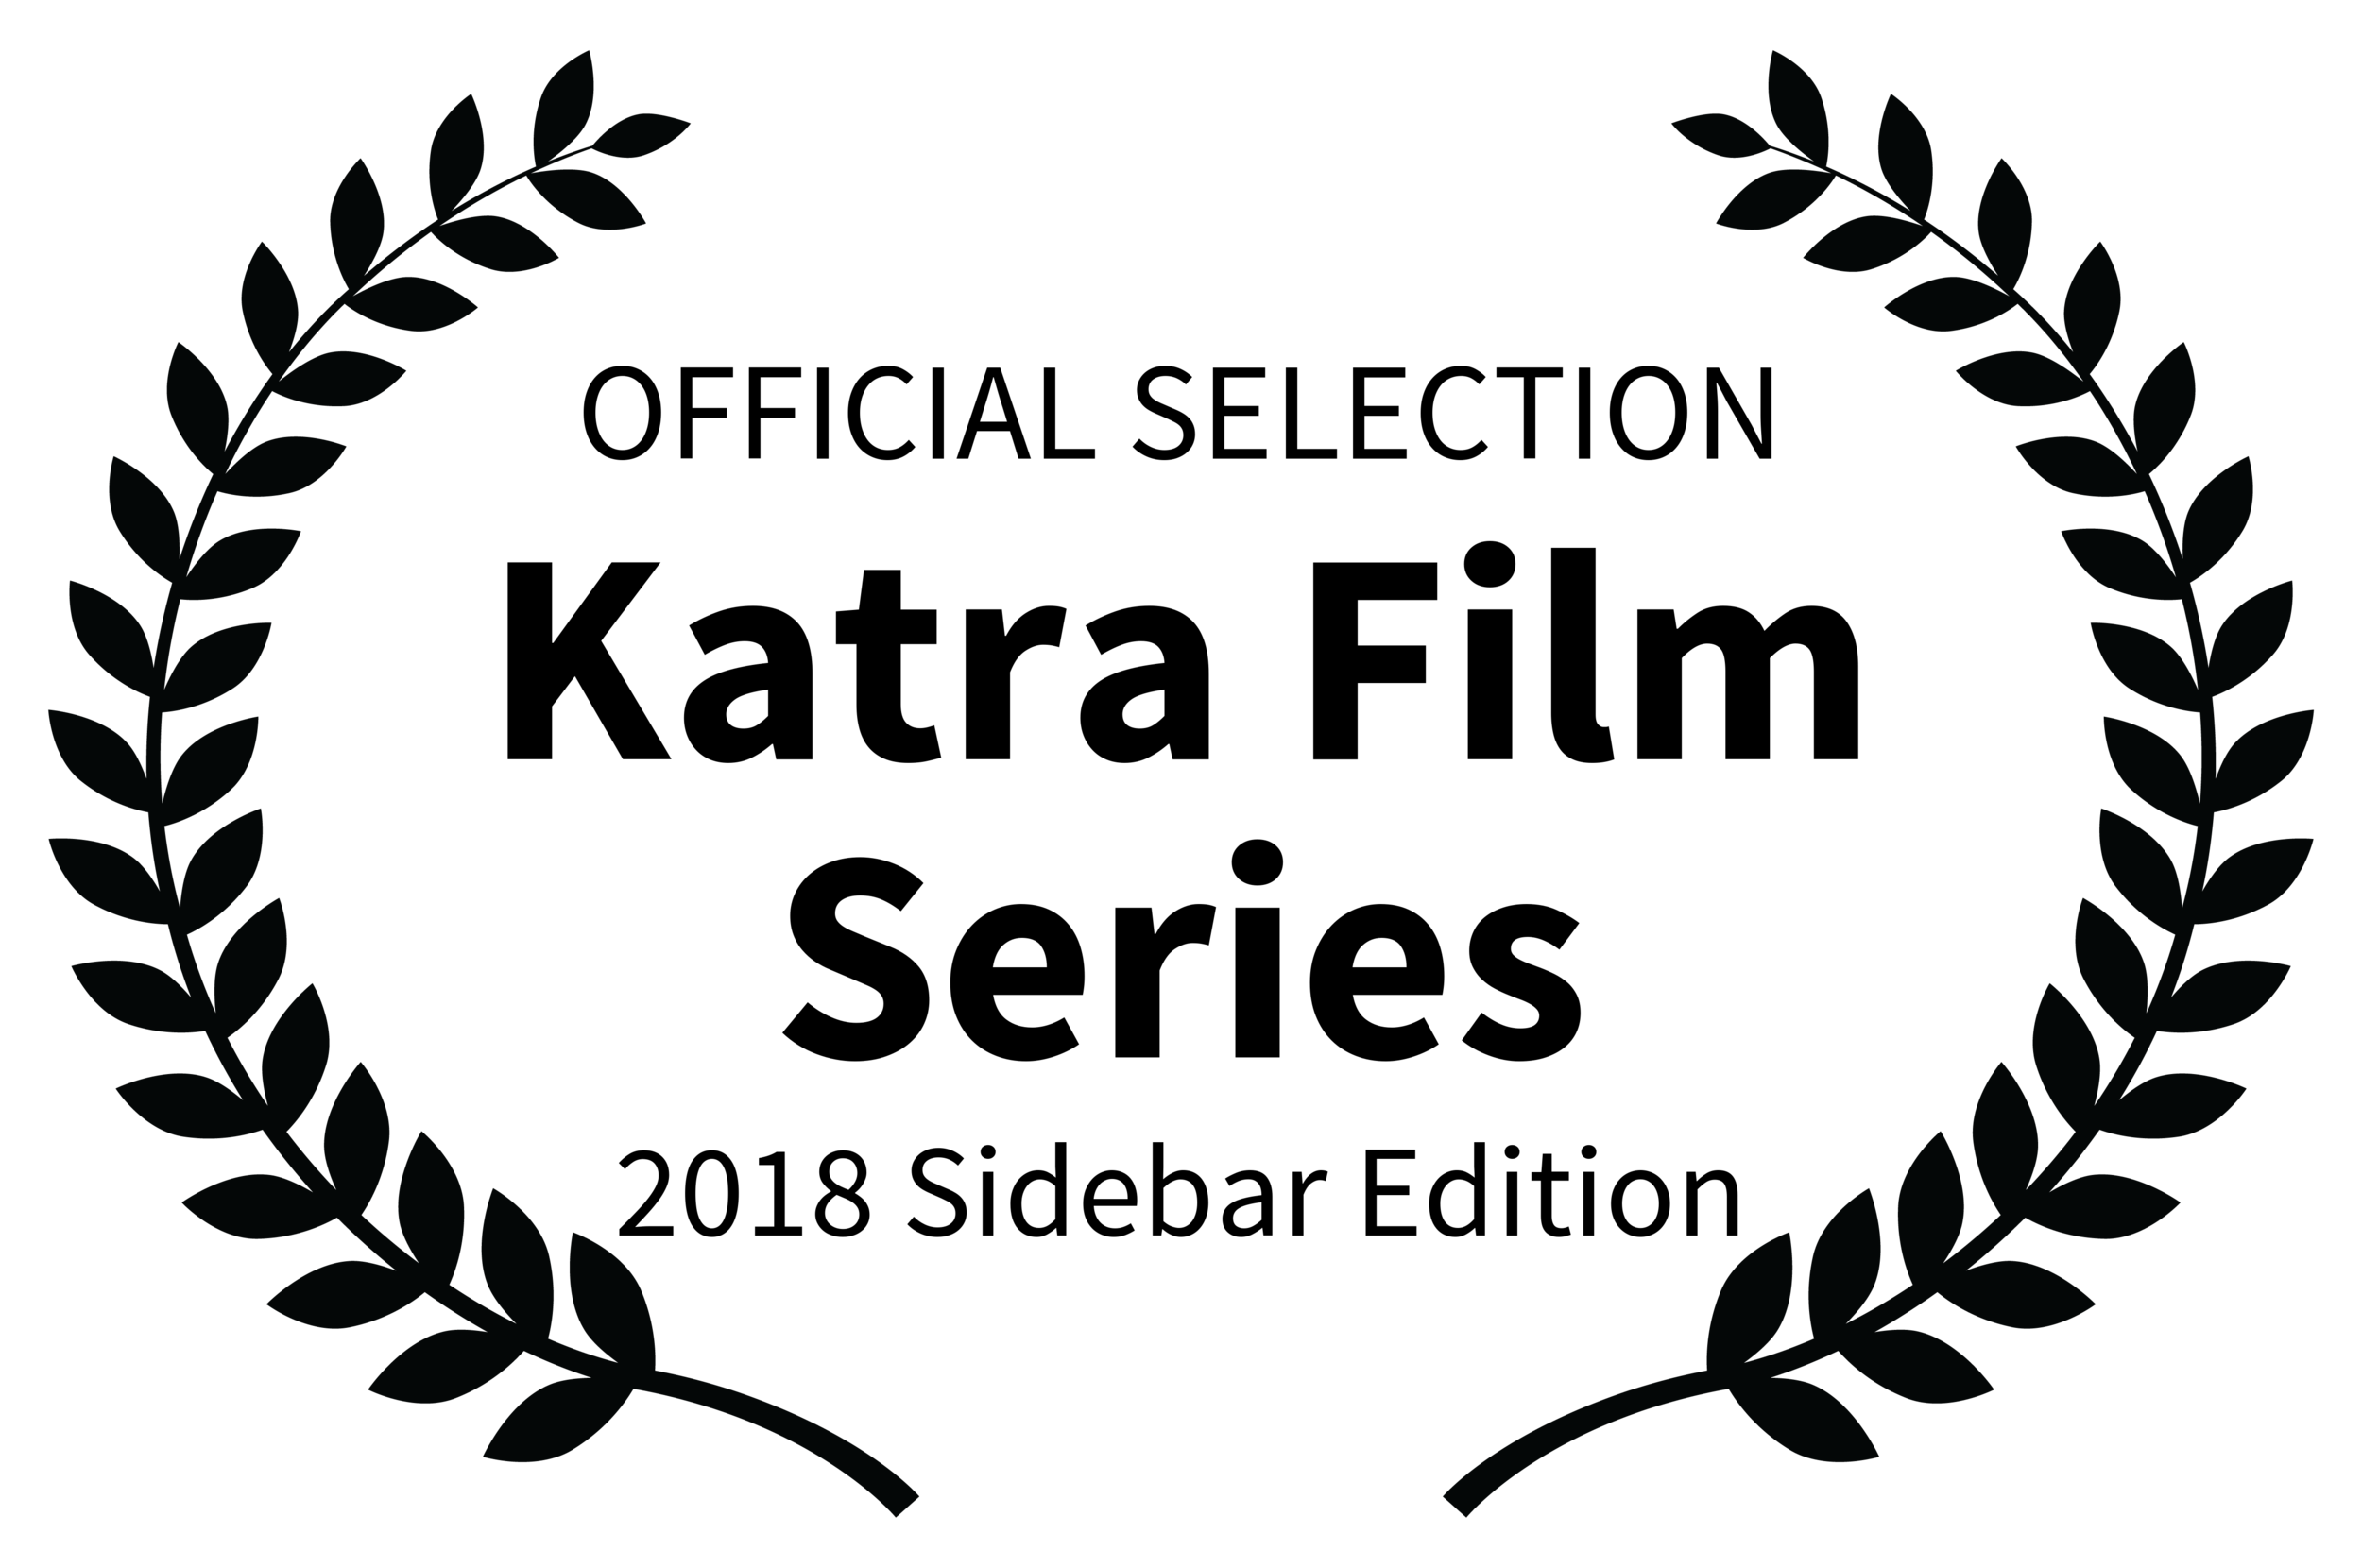 OFFICIALSELECTION-KatraFilmSeries-2018SidebarEdition (1).png